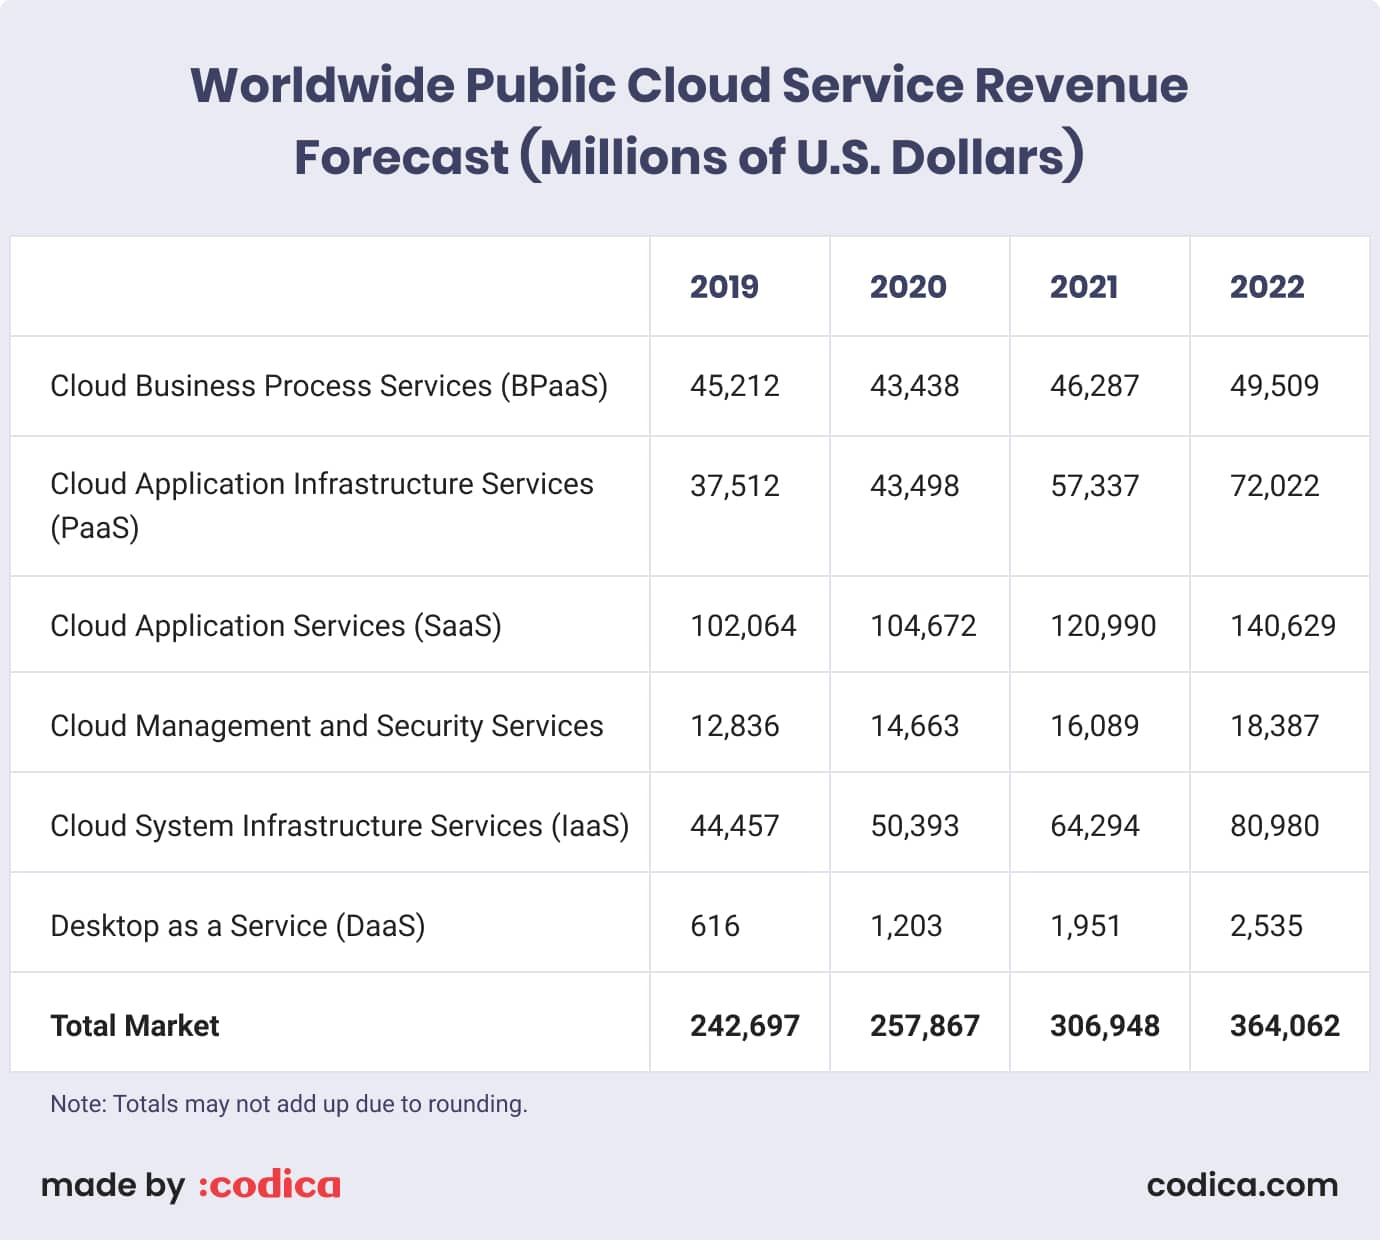 Forecast of global public cloud service revenue (2019-2022)